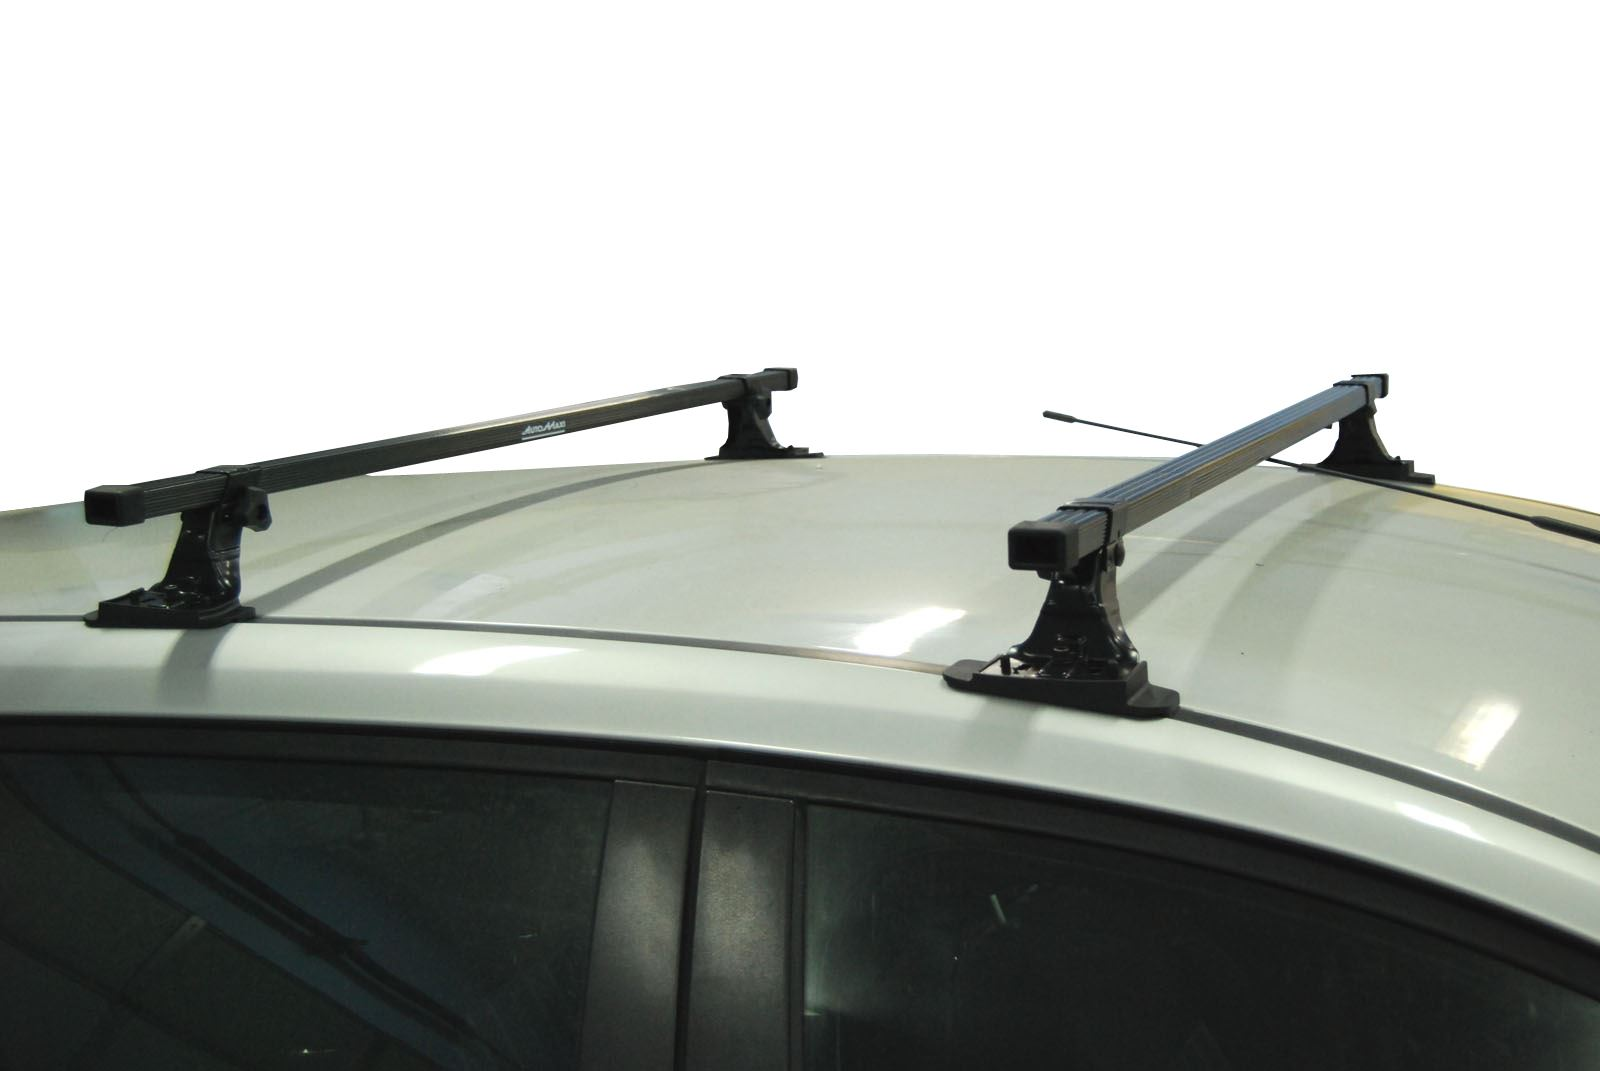 Mont Blanc Roof Rack Cross Bars Rack Fits Vauxhall Opel